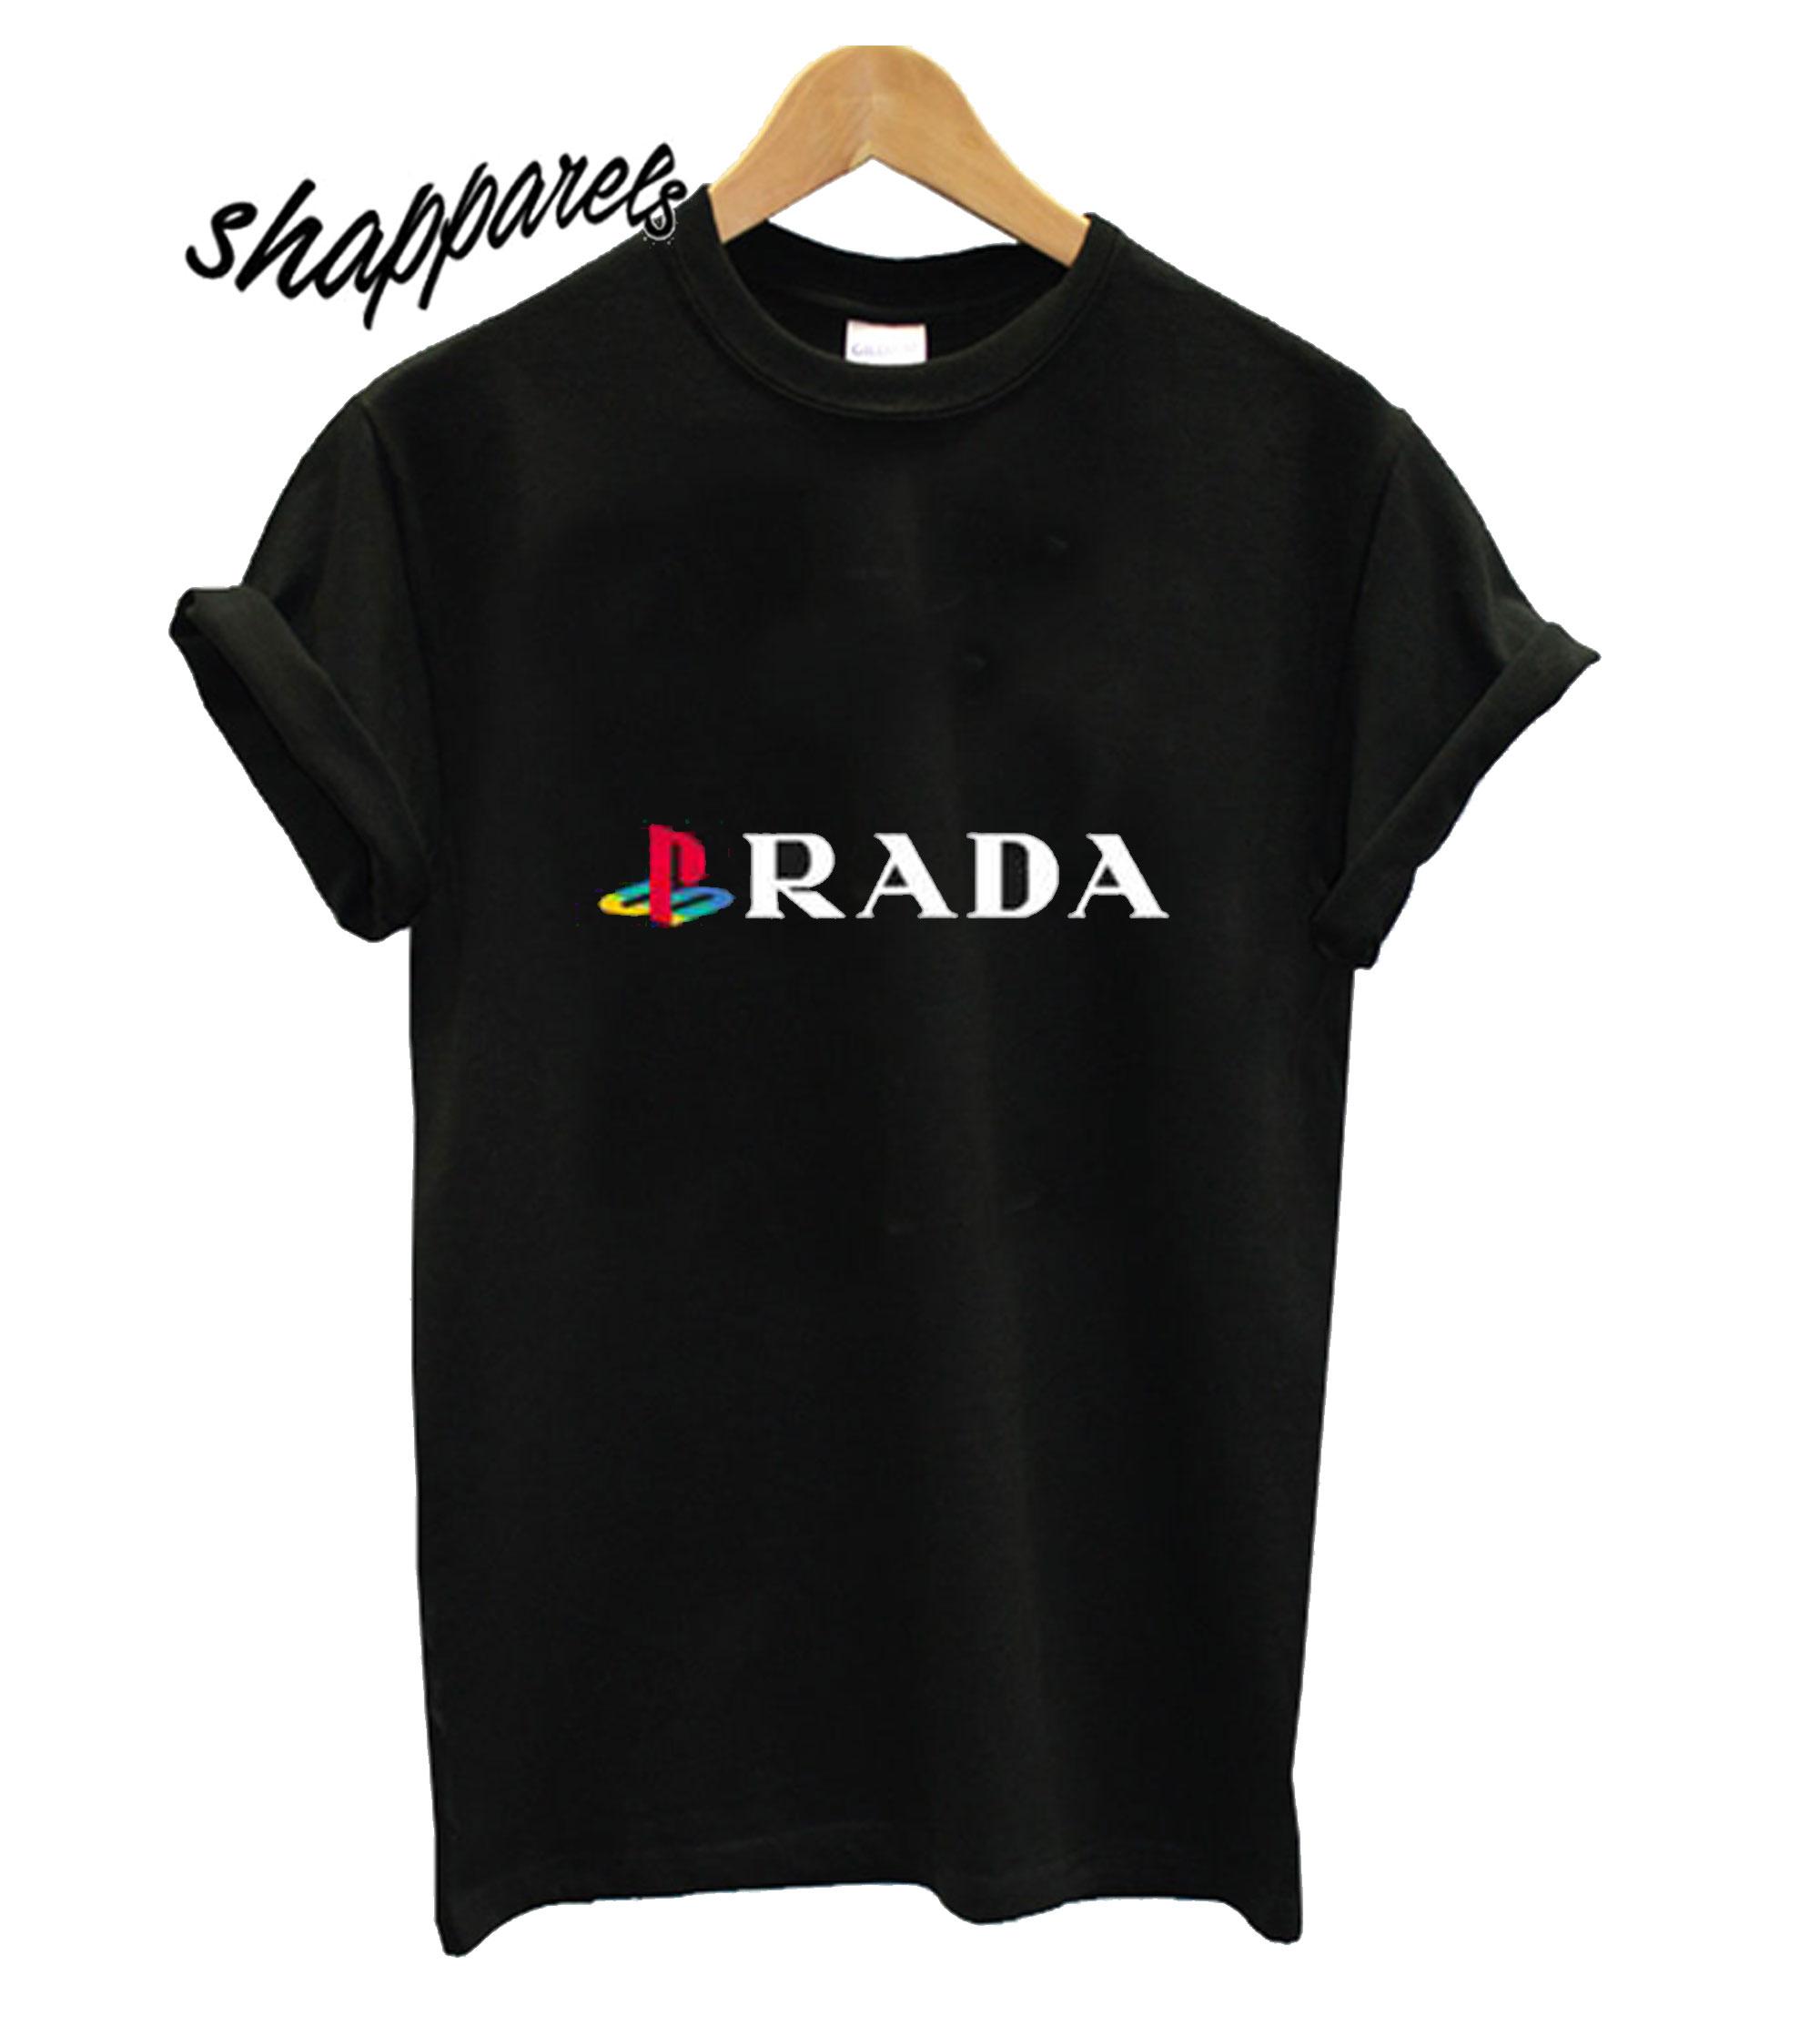 344771ca2ef183 Playstation Prada T shirt